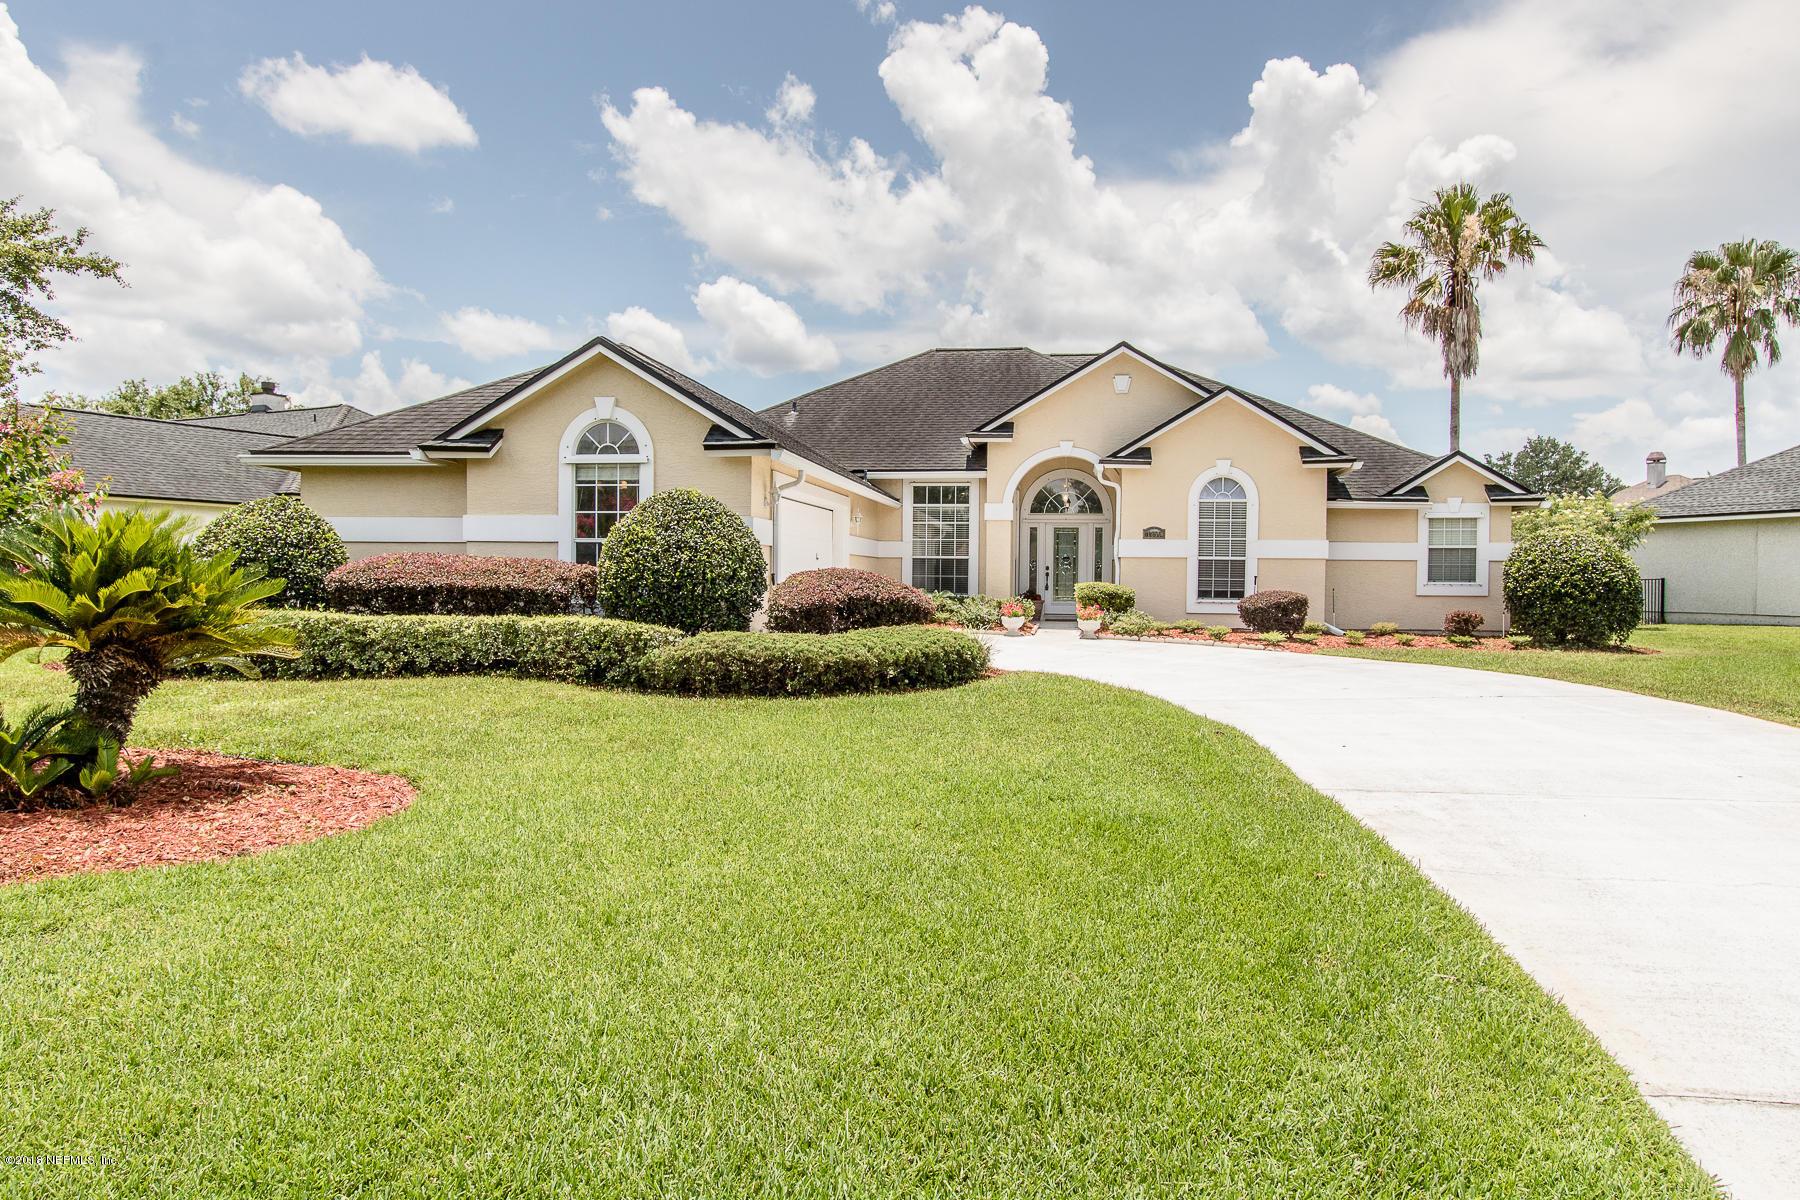 1859 BLUEBONNET, FLEMING ISLAND, FLORIDA 32003, 4 Bedrooms Bedrooms, ,3 BathroomsBathrooms,Residential - single family,For sale,BLUEBONNET,955159